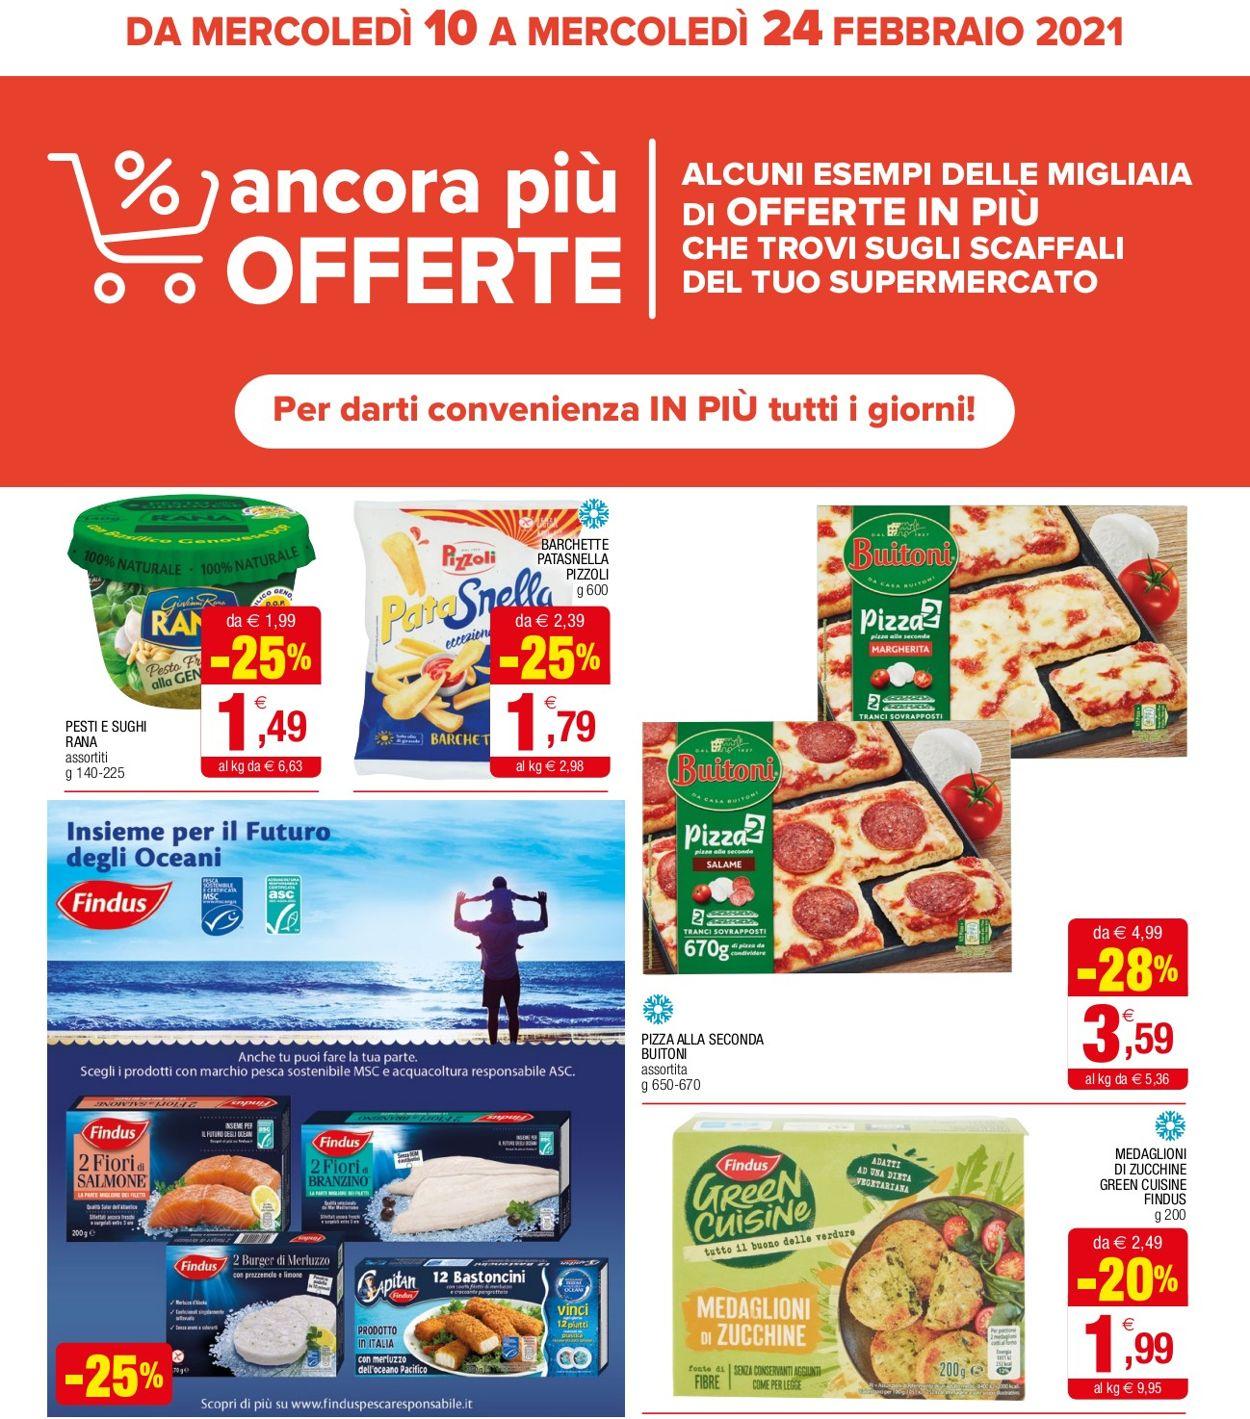 Volantino Iperal - Offerte 10/02-24/02/2021